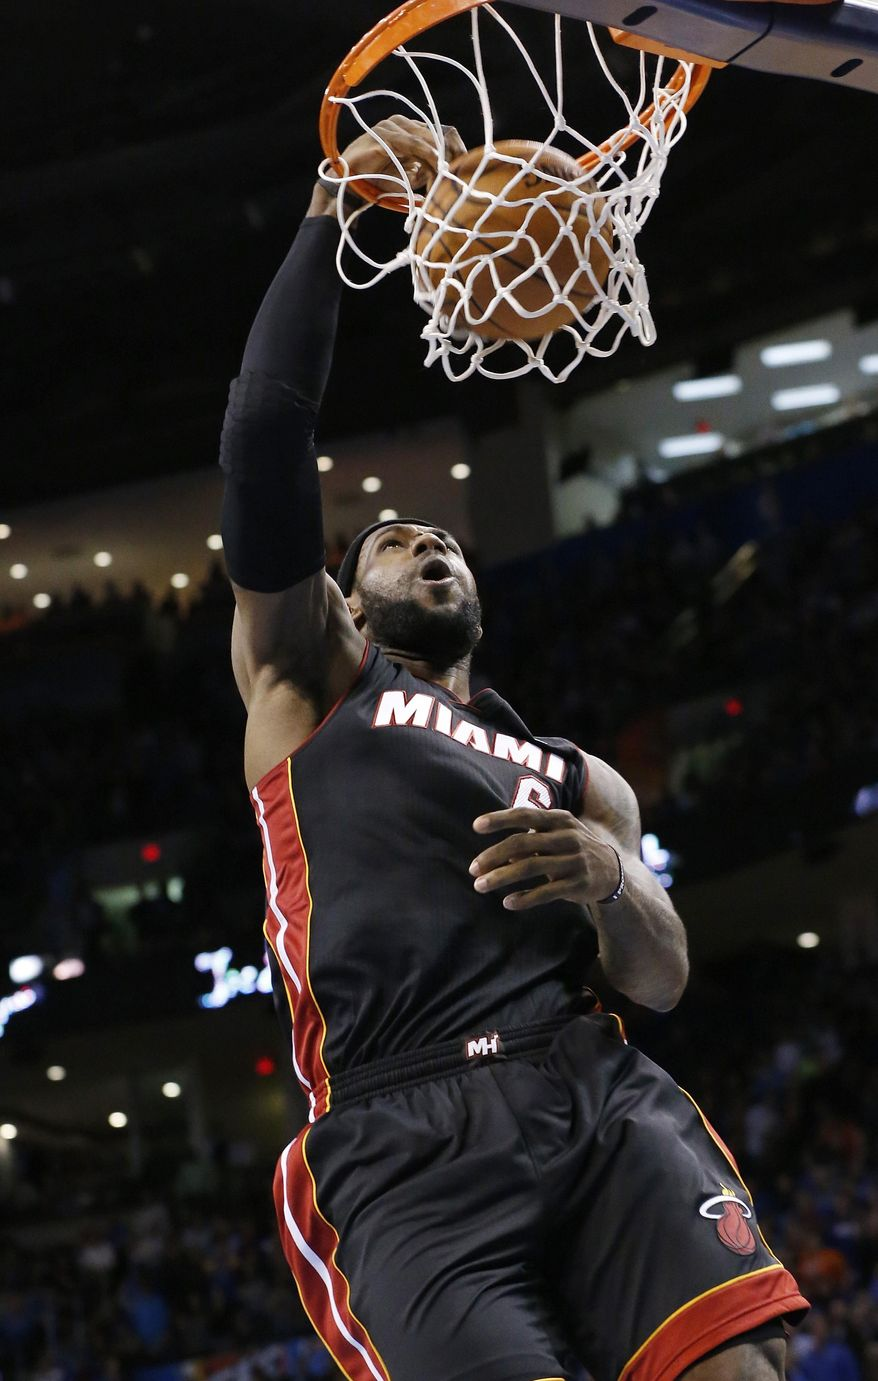 Miami Heat forward LeBron James (6) dunks during the first quarter of an NBA basketball game against the Oklahoma City Thunder in Oklahoma City, Thursday, Feb. 20, 2014. (AP Photo/Sue Ogrocki)